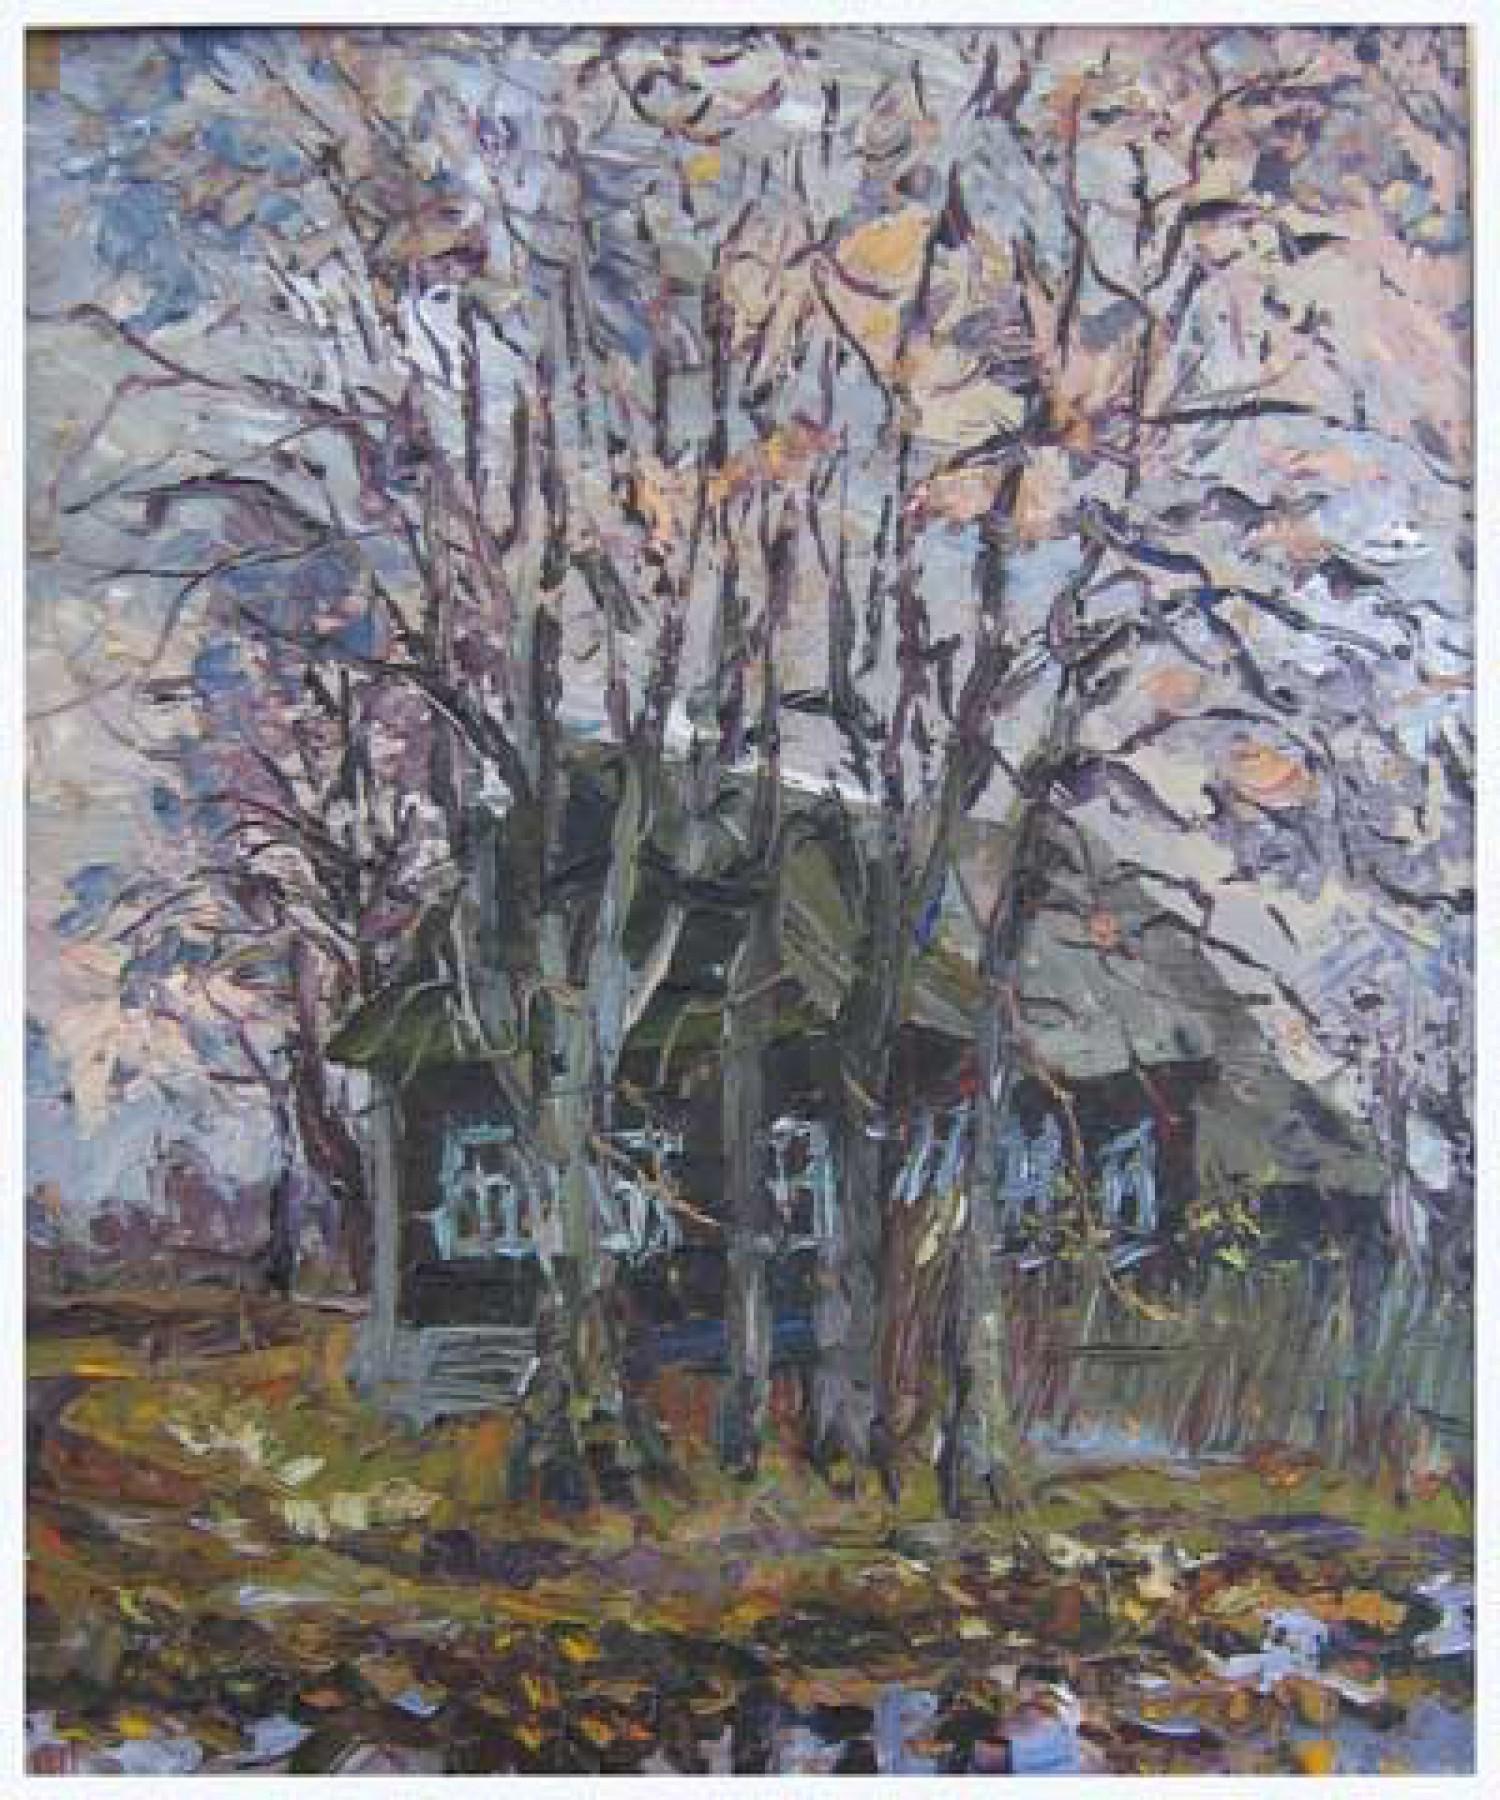 В.В.Теплов. Дом на отшибе. 2003. 60х50. ДВП, м.